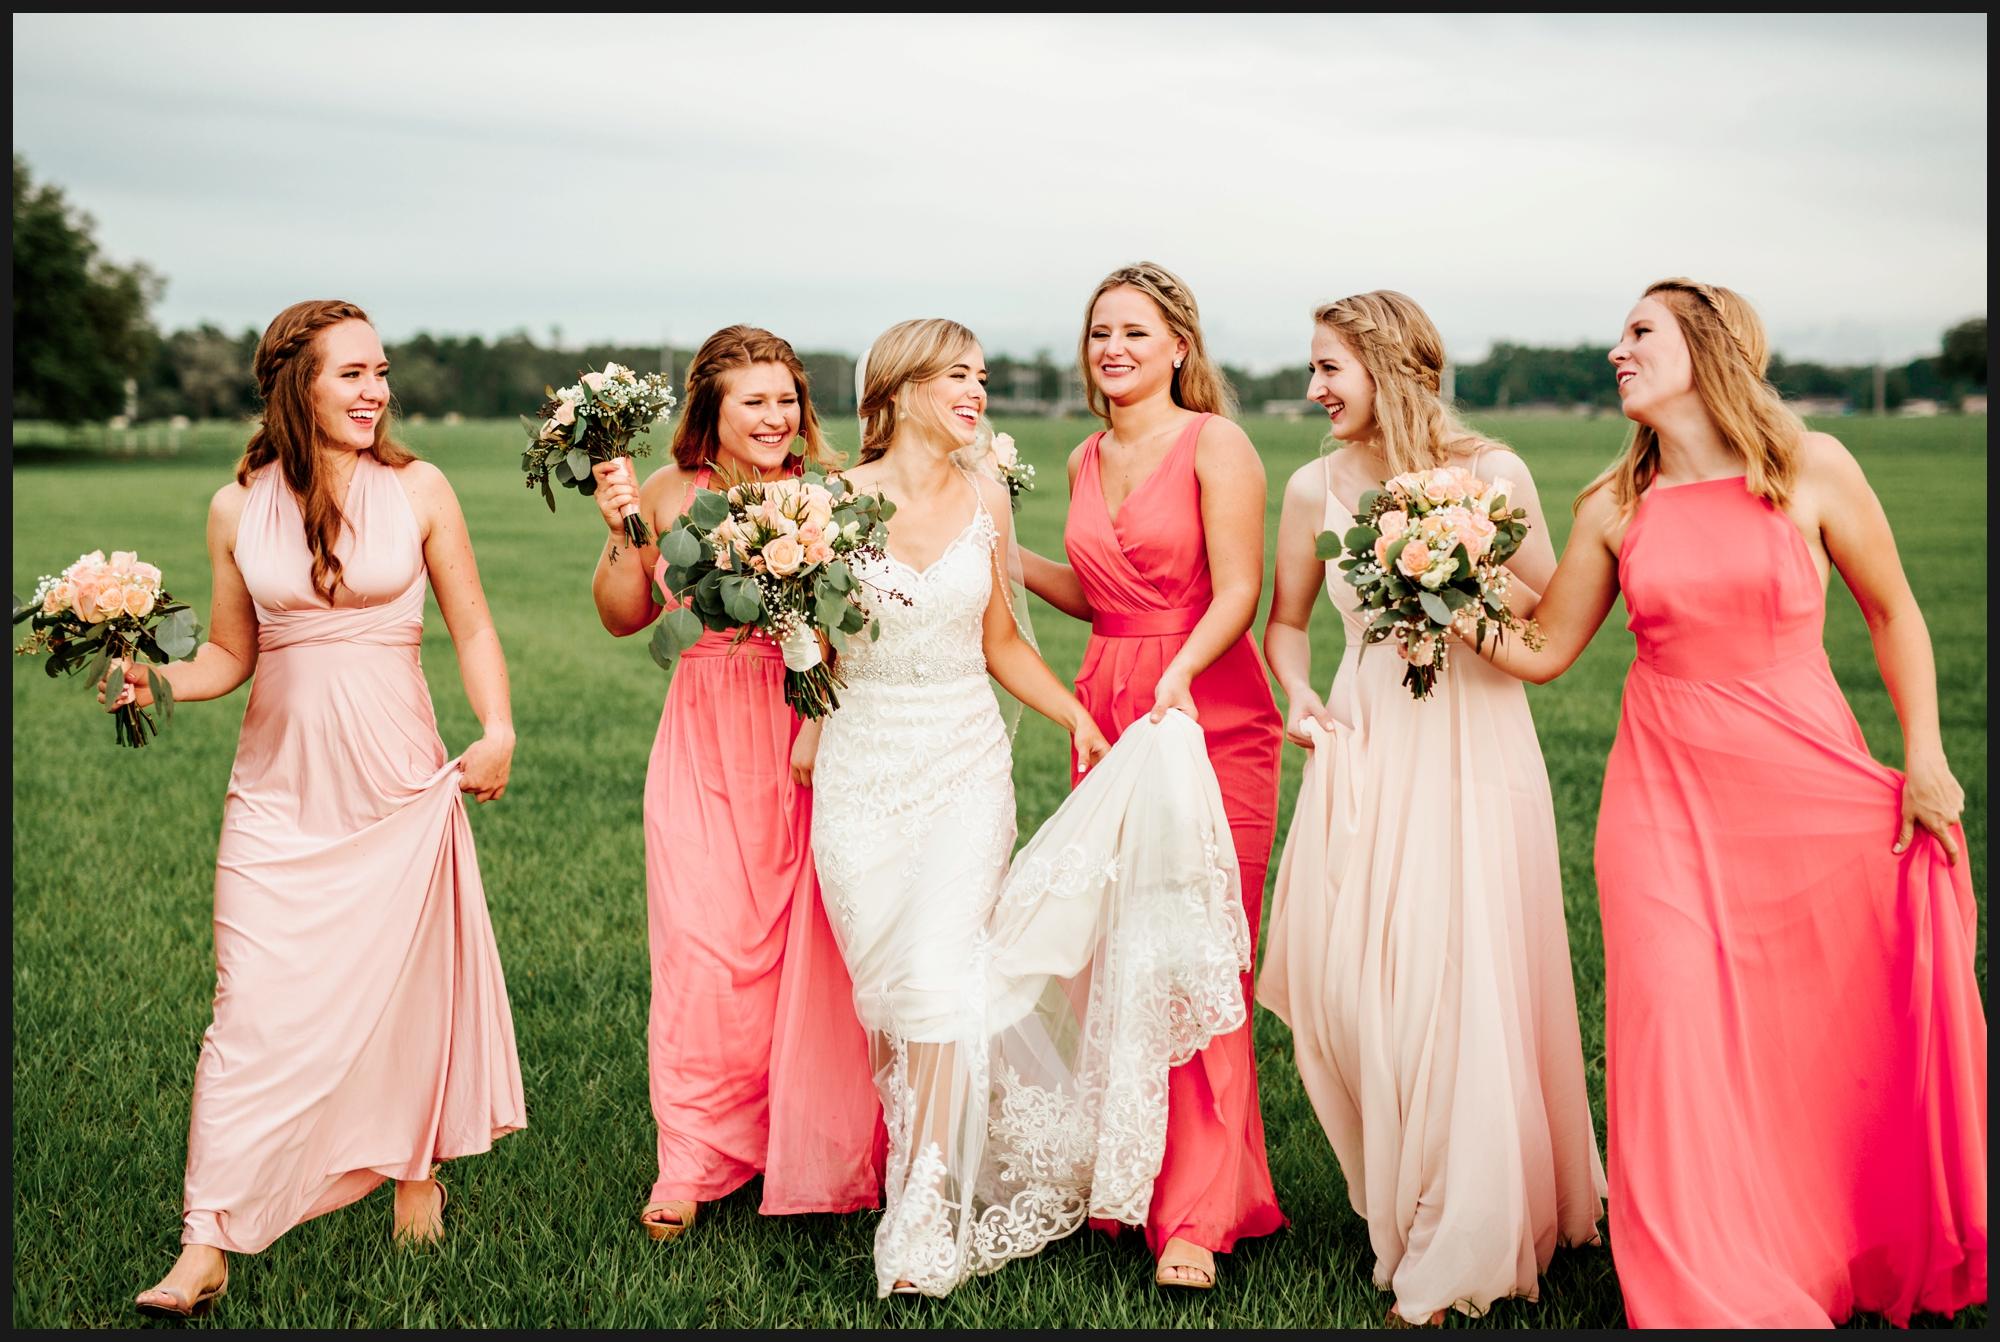 Orlando-Wedding-Photographer-destination-wedding-photographer-florida-wedding-photographer-hawaii-wedding-photographer_0320.jpg